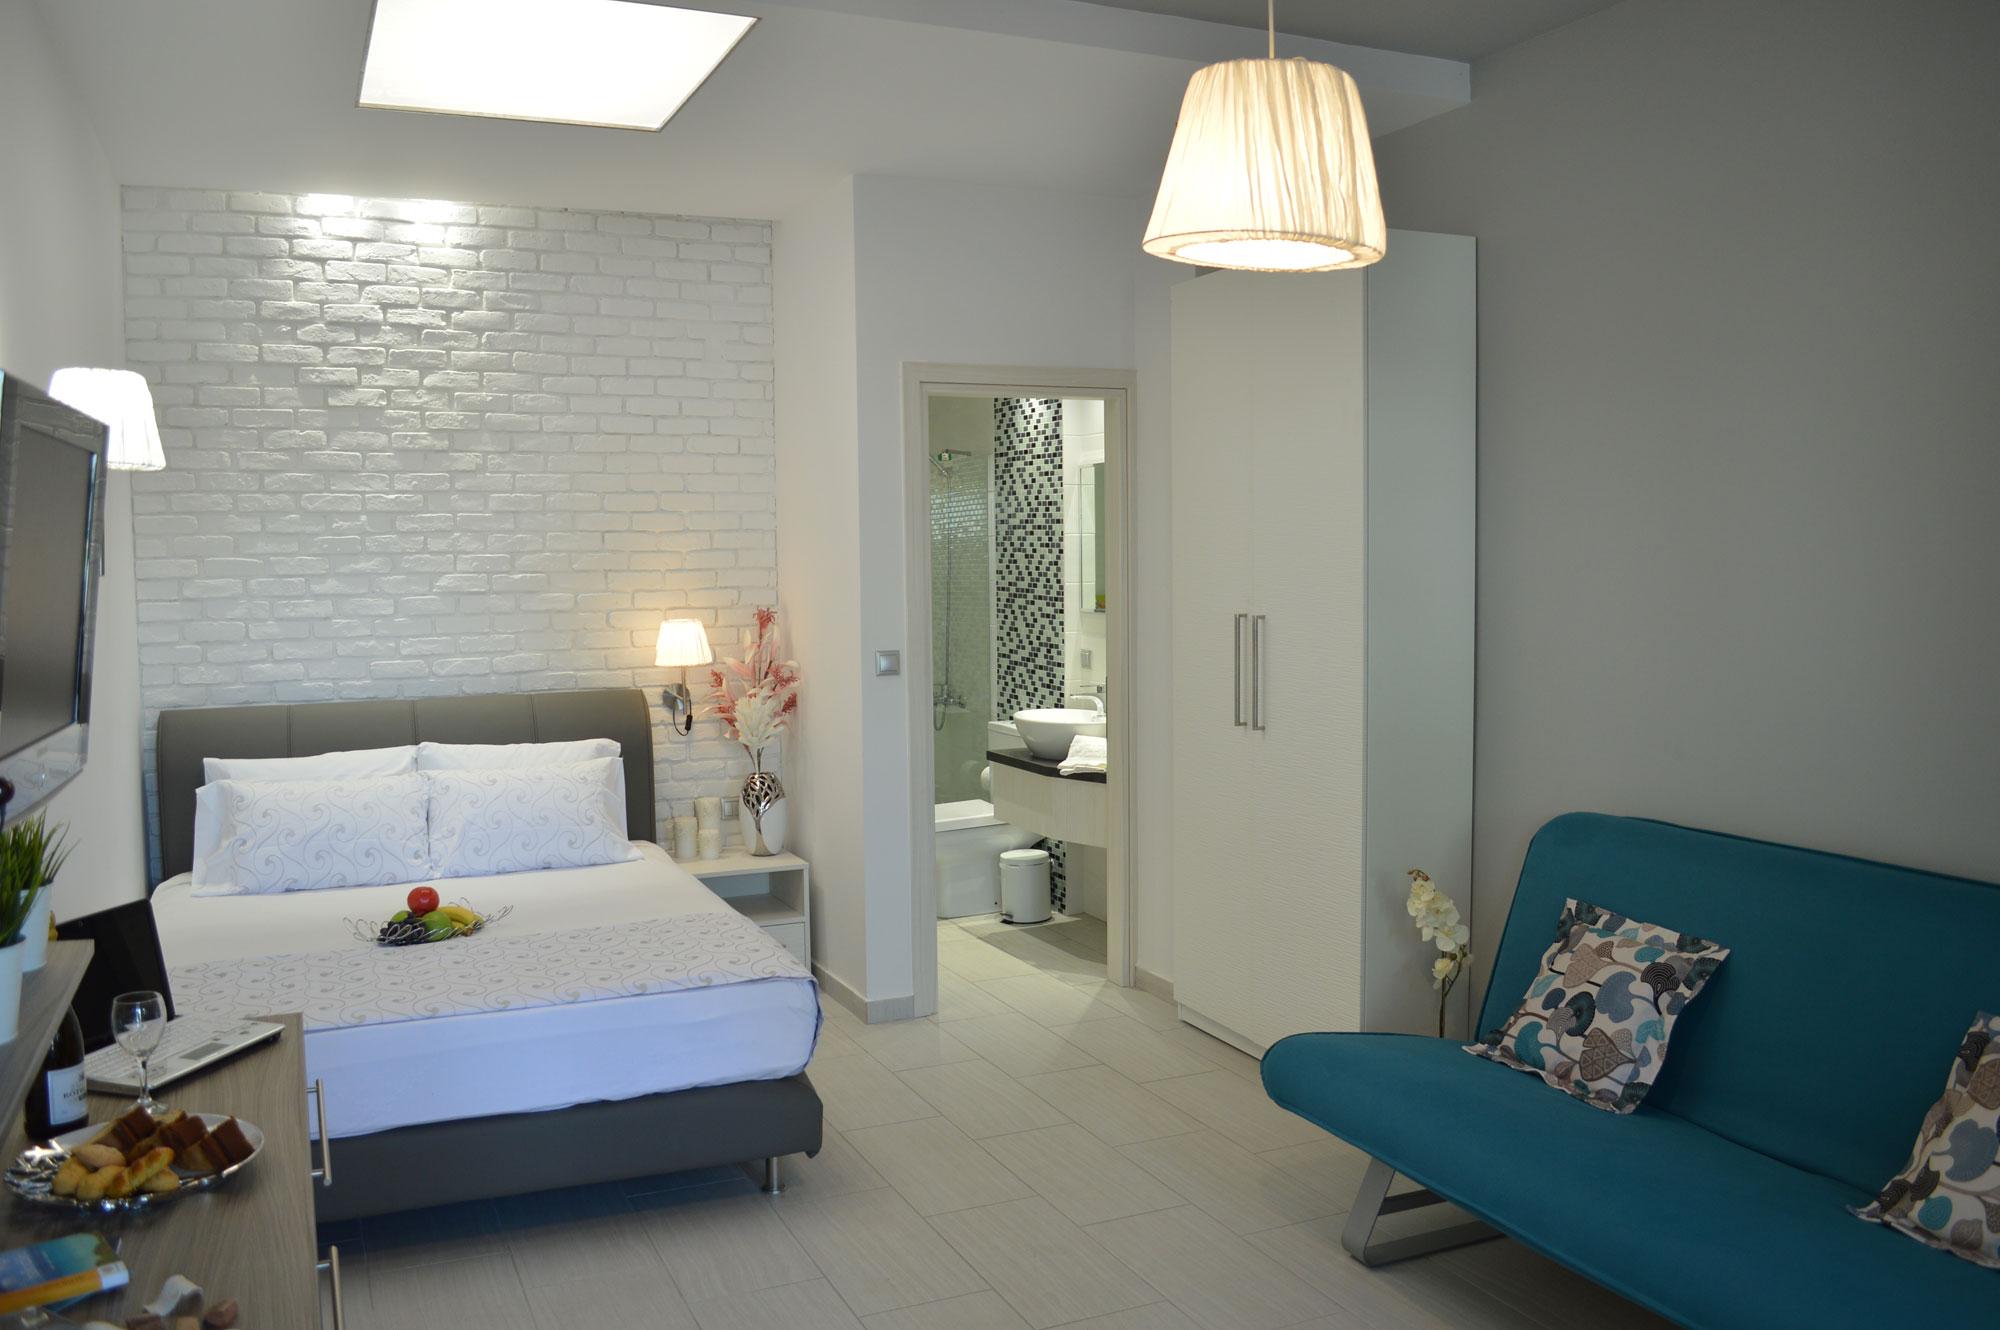 http://aqua-villas.gr/wp-content/uploads/2014/12/5.jpg